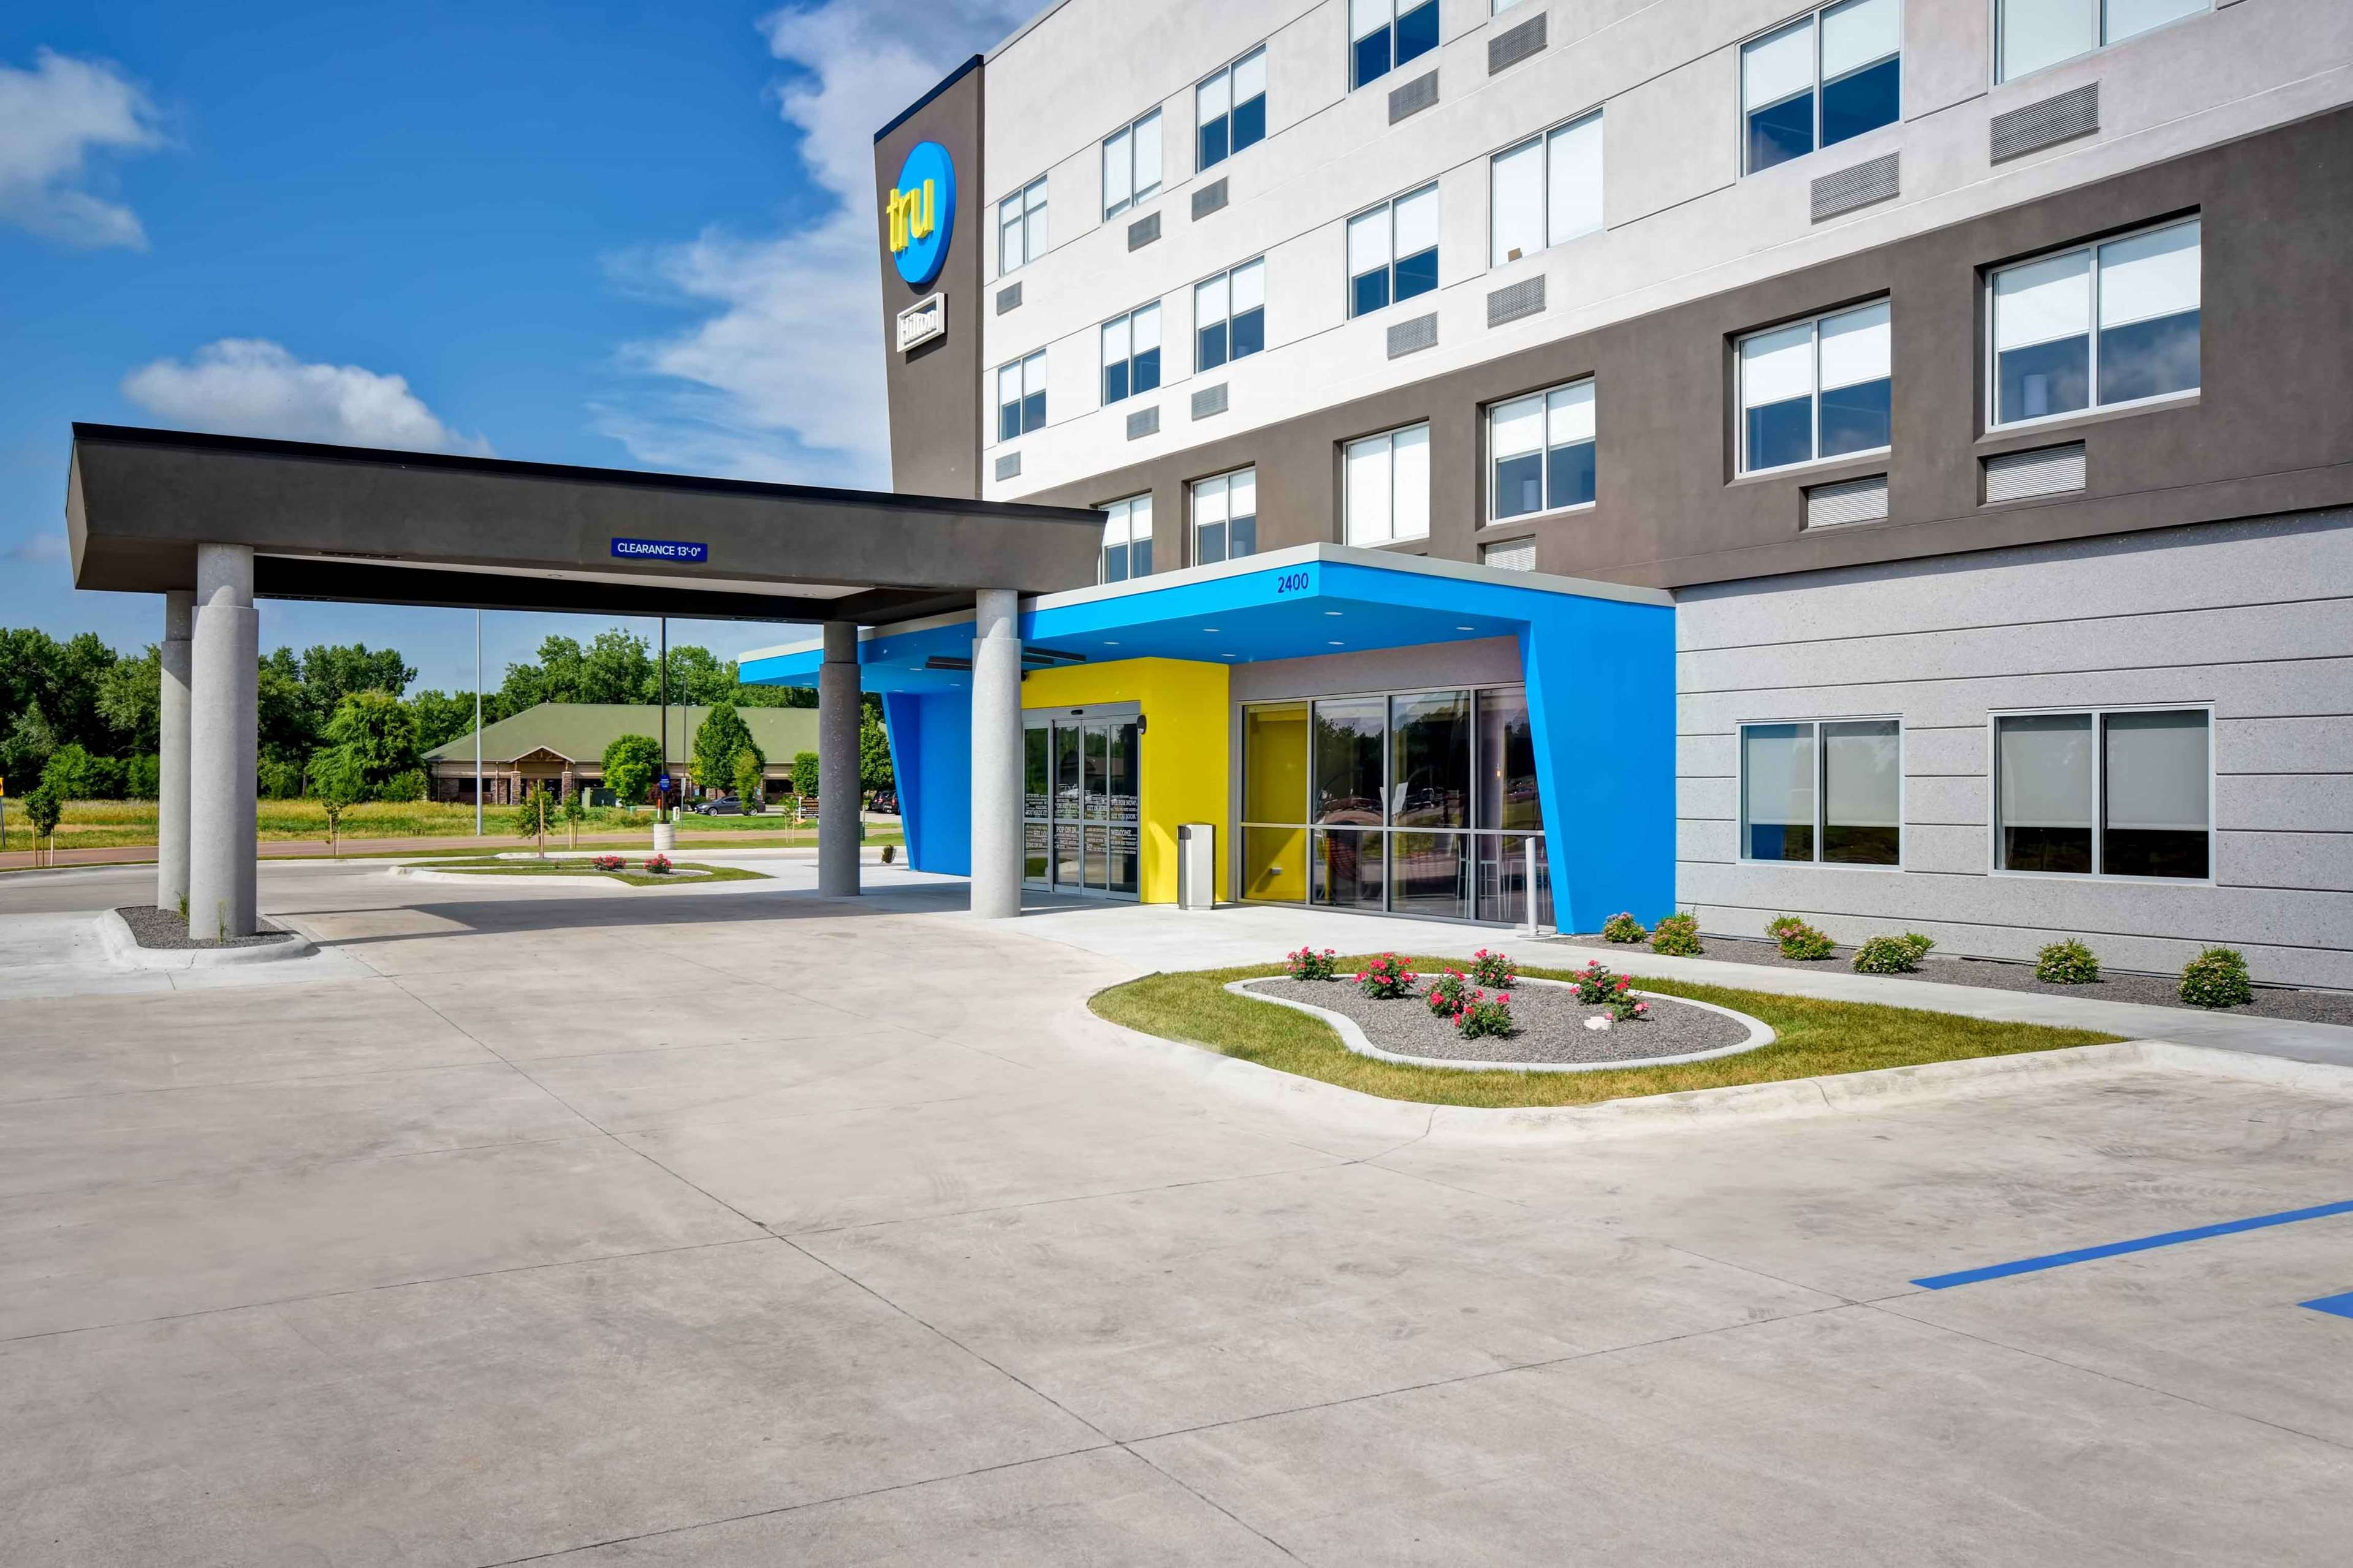 Tru by Hilton North Platte image 1